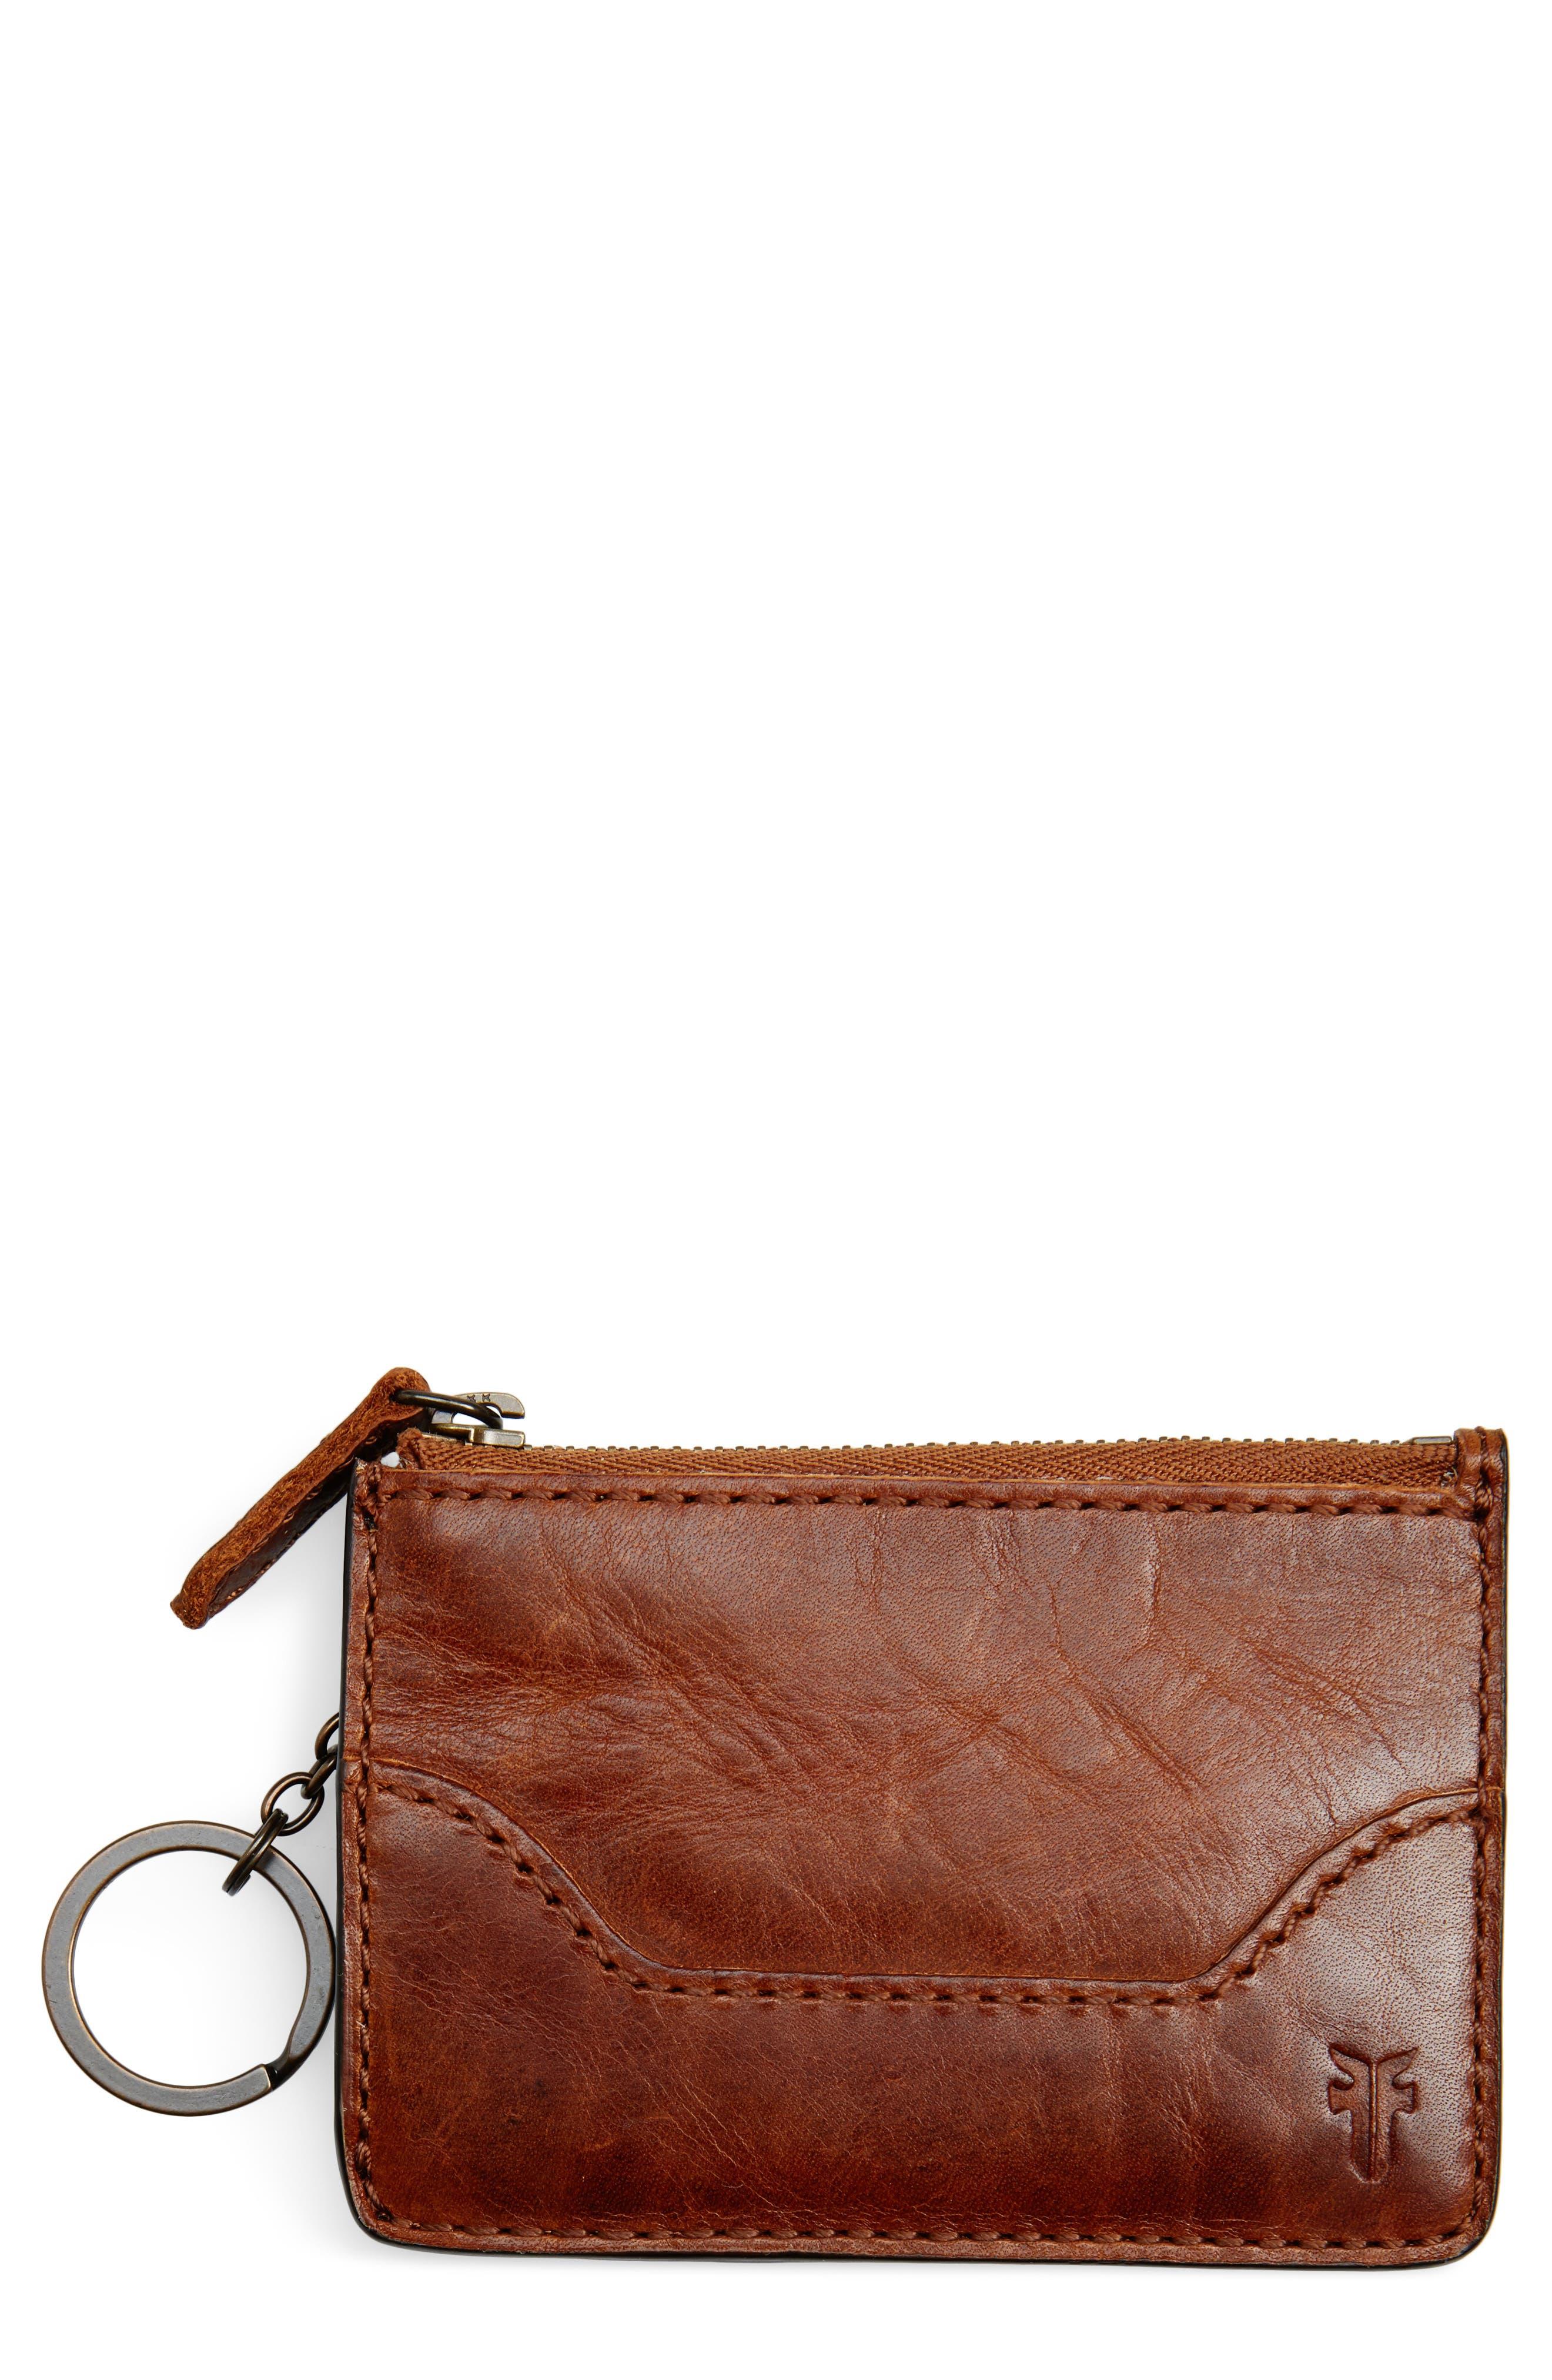 Main Image - Frye Melissa Leather Card Holder with Key Ring